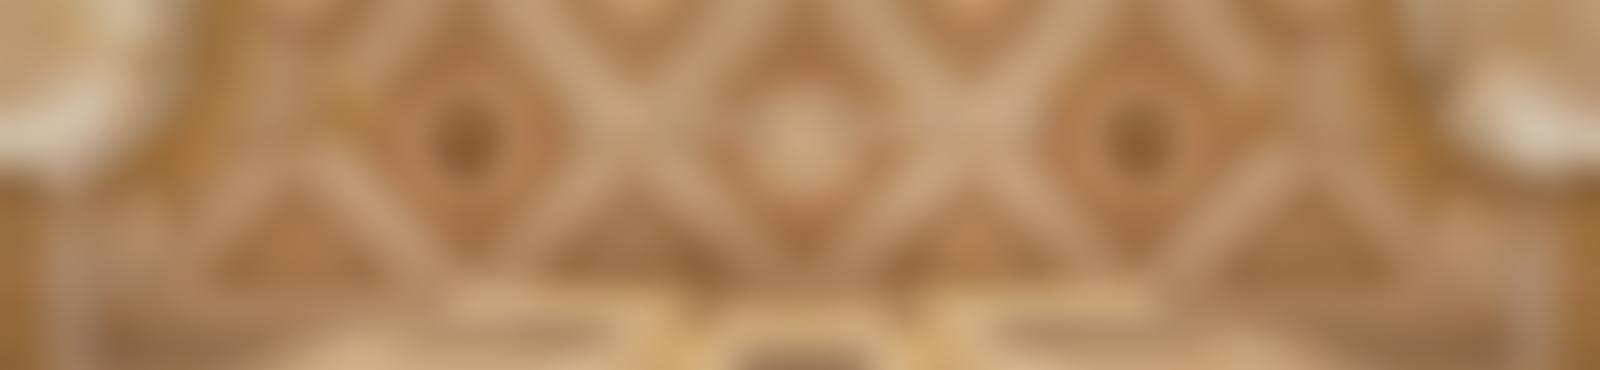 Blurred 561b4632 77fe 412b b52a 3cb019c7ac95